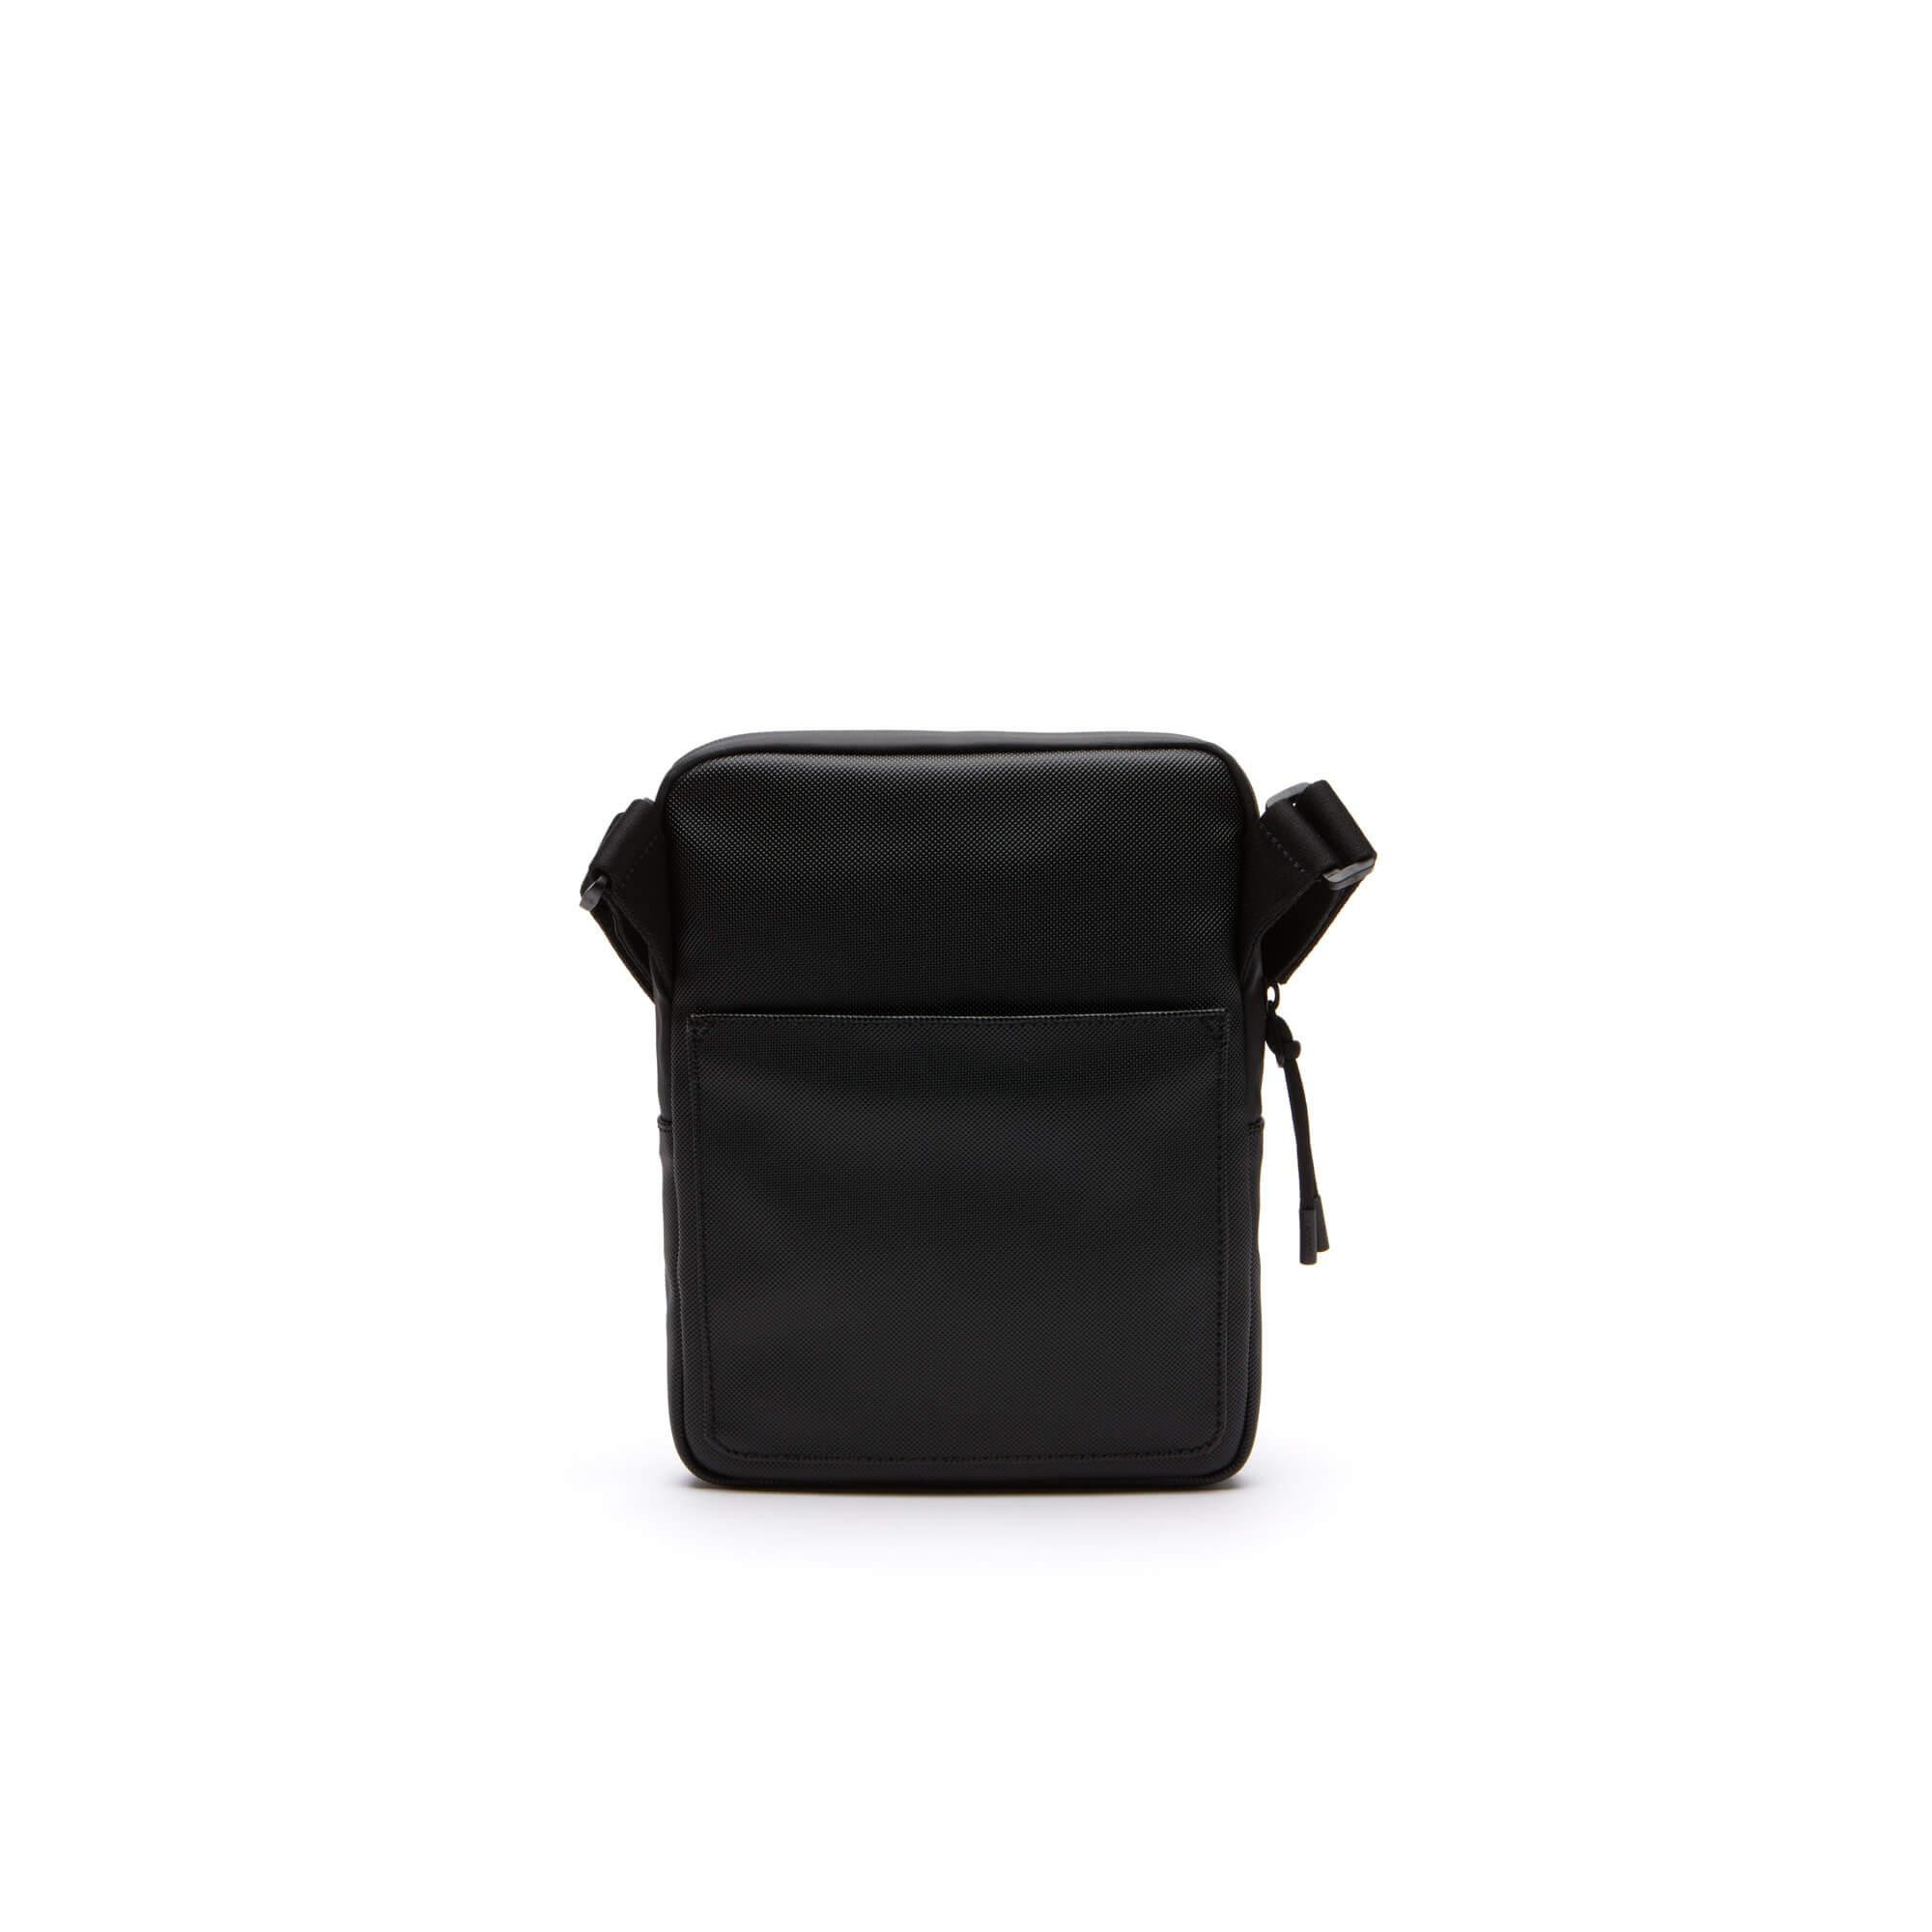 Lacoste Erkek L.12.12 Concept Siyah Kamera Çantası